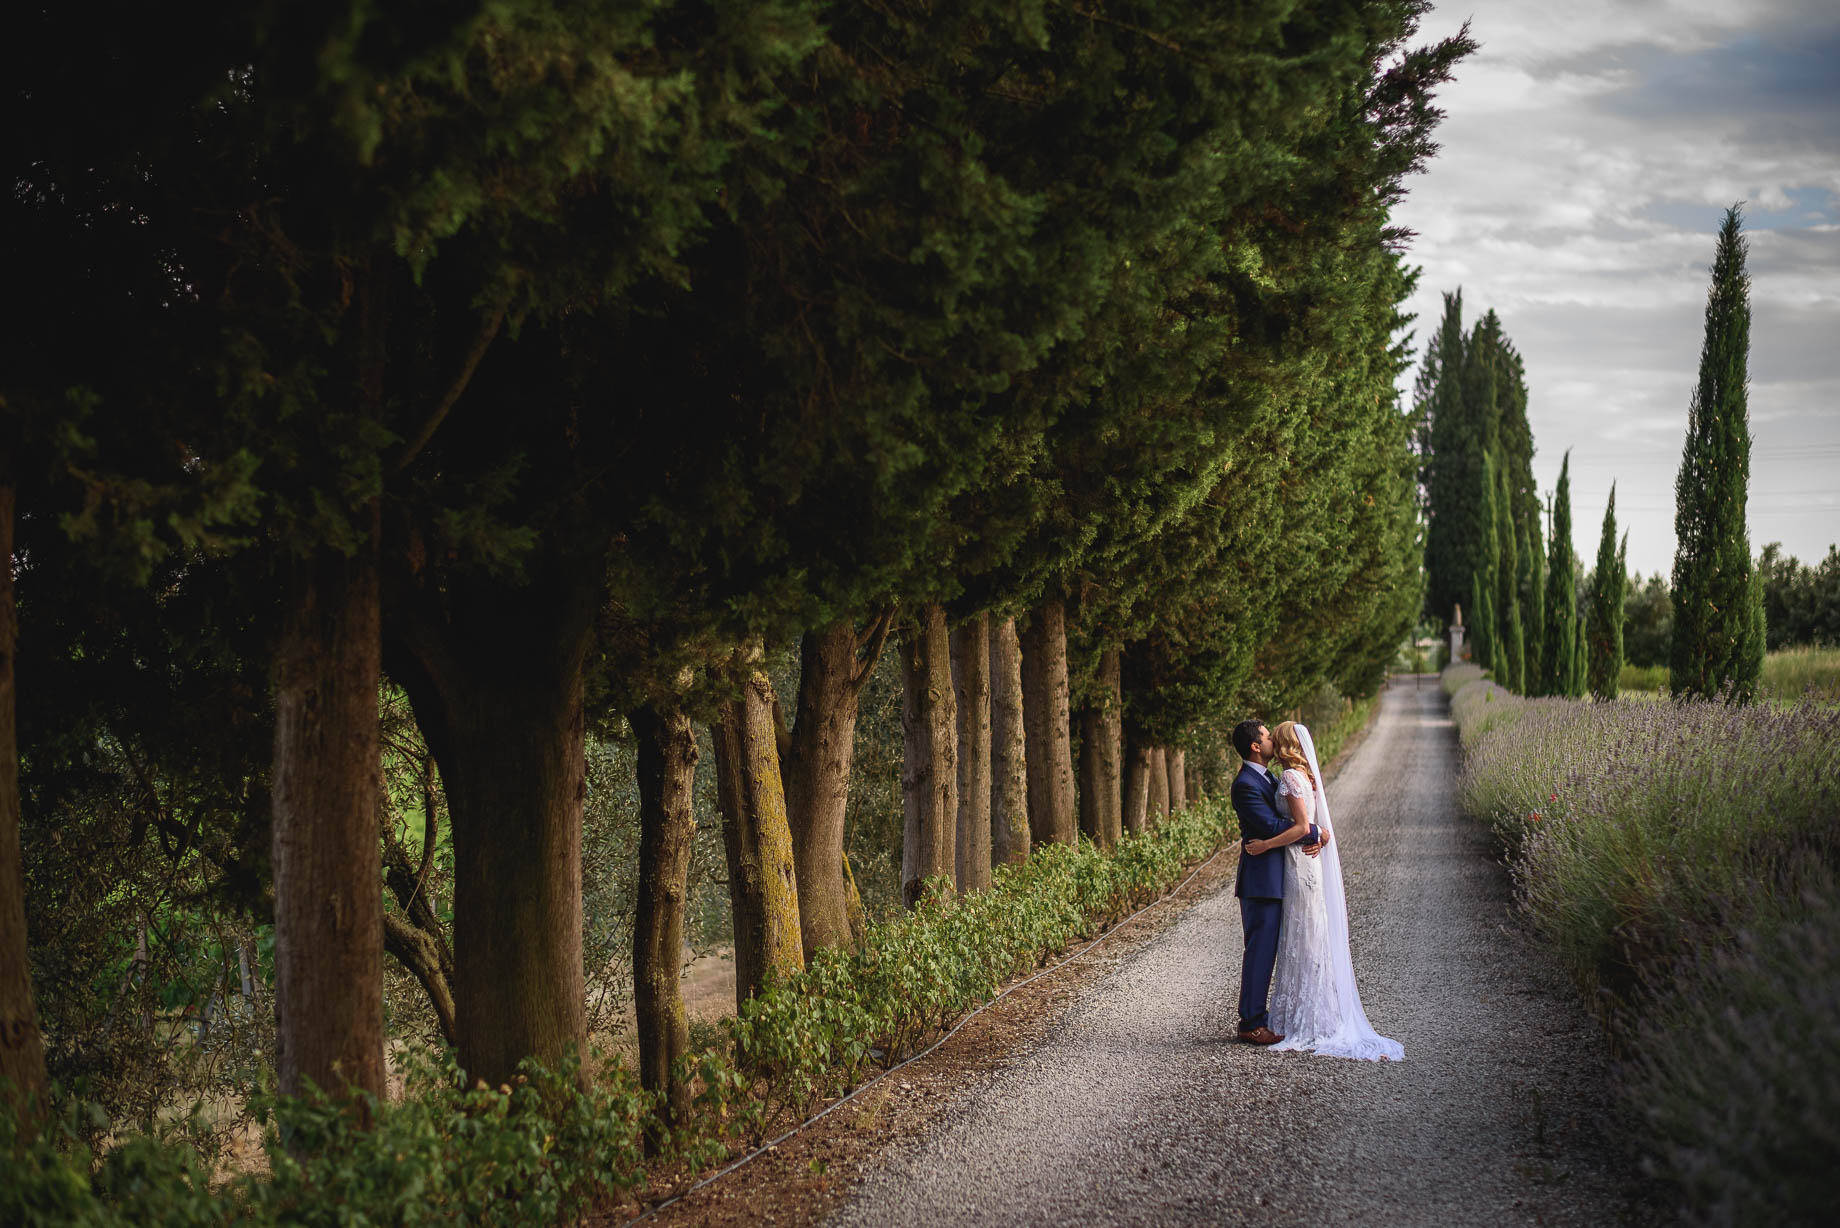 villa-mangiacane-couple-by-driveway